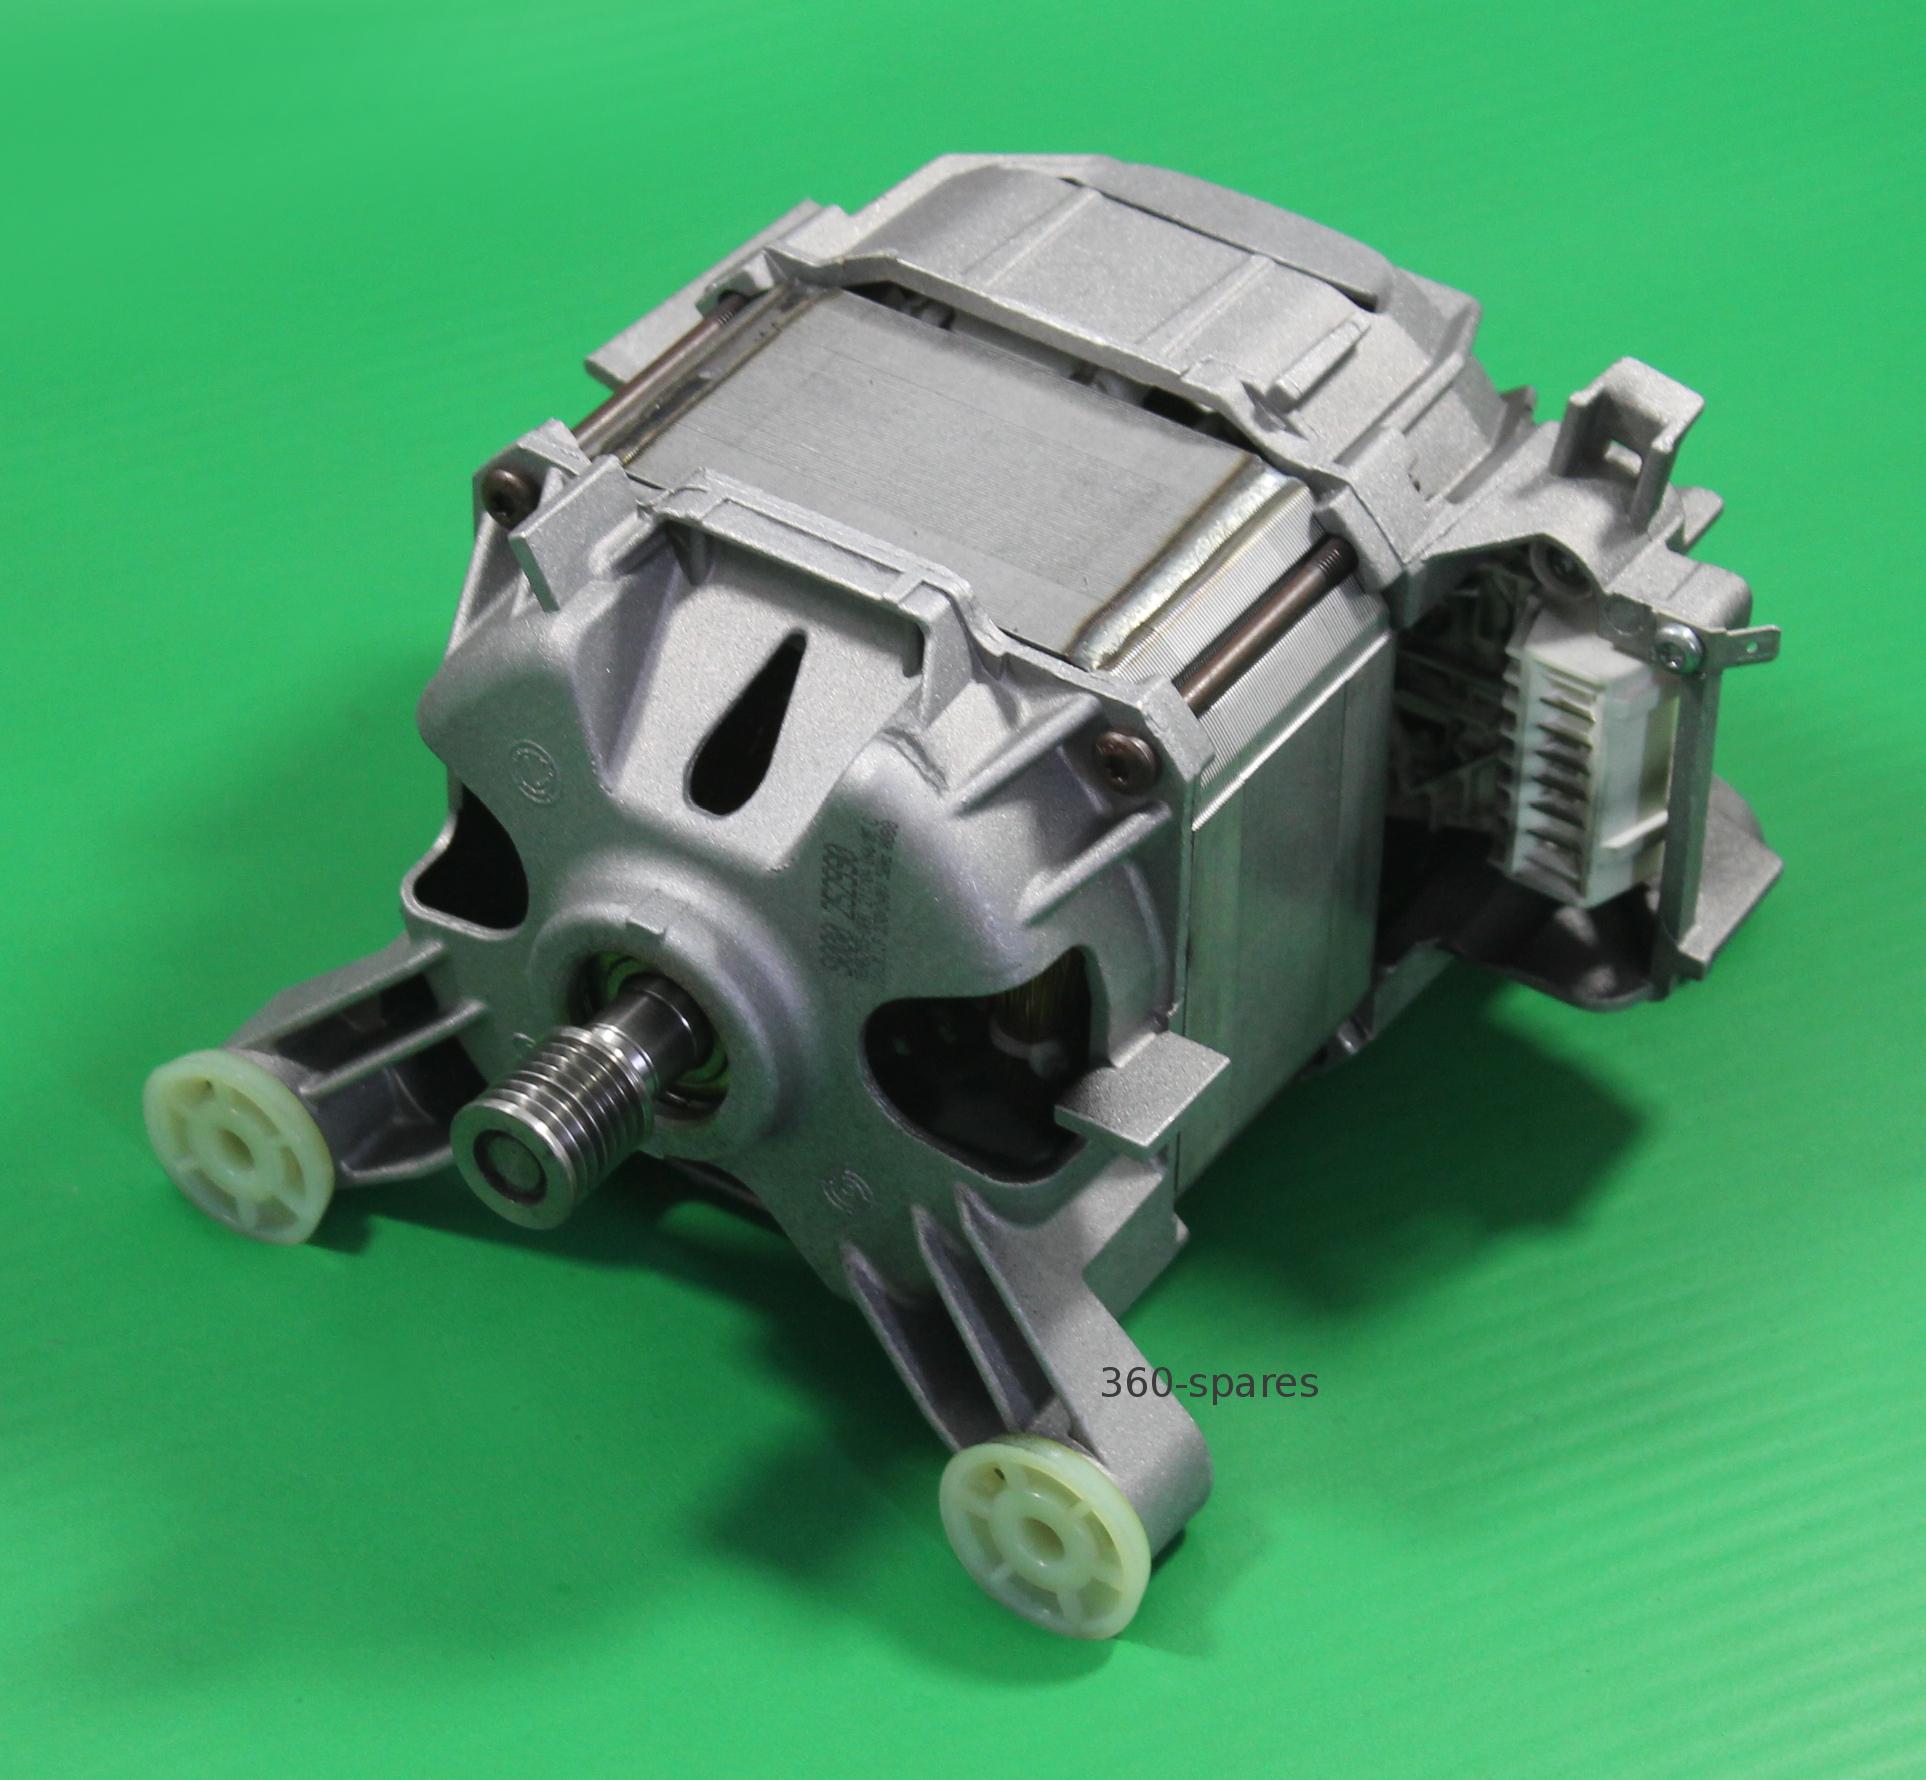 Bosch wae24465gb washing machine motor 9000252990 for Motor for bosch washing machine